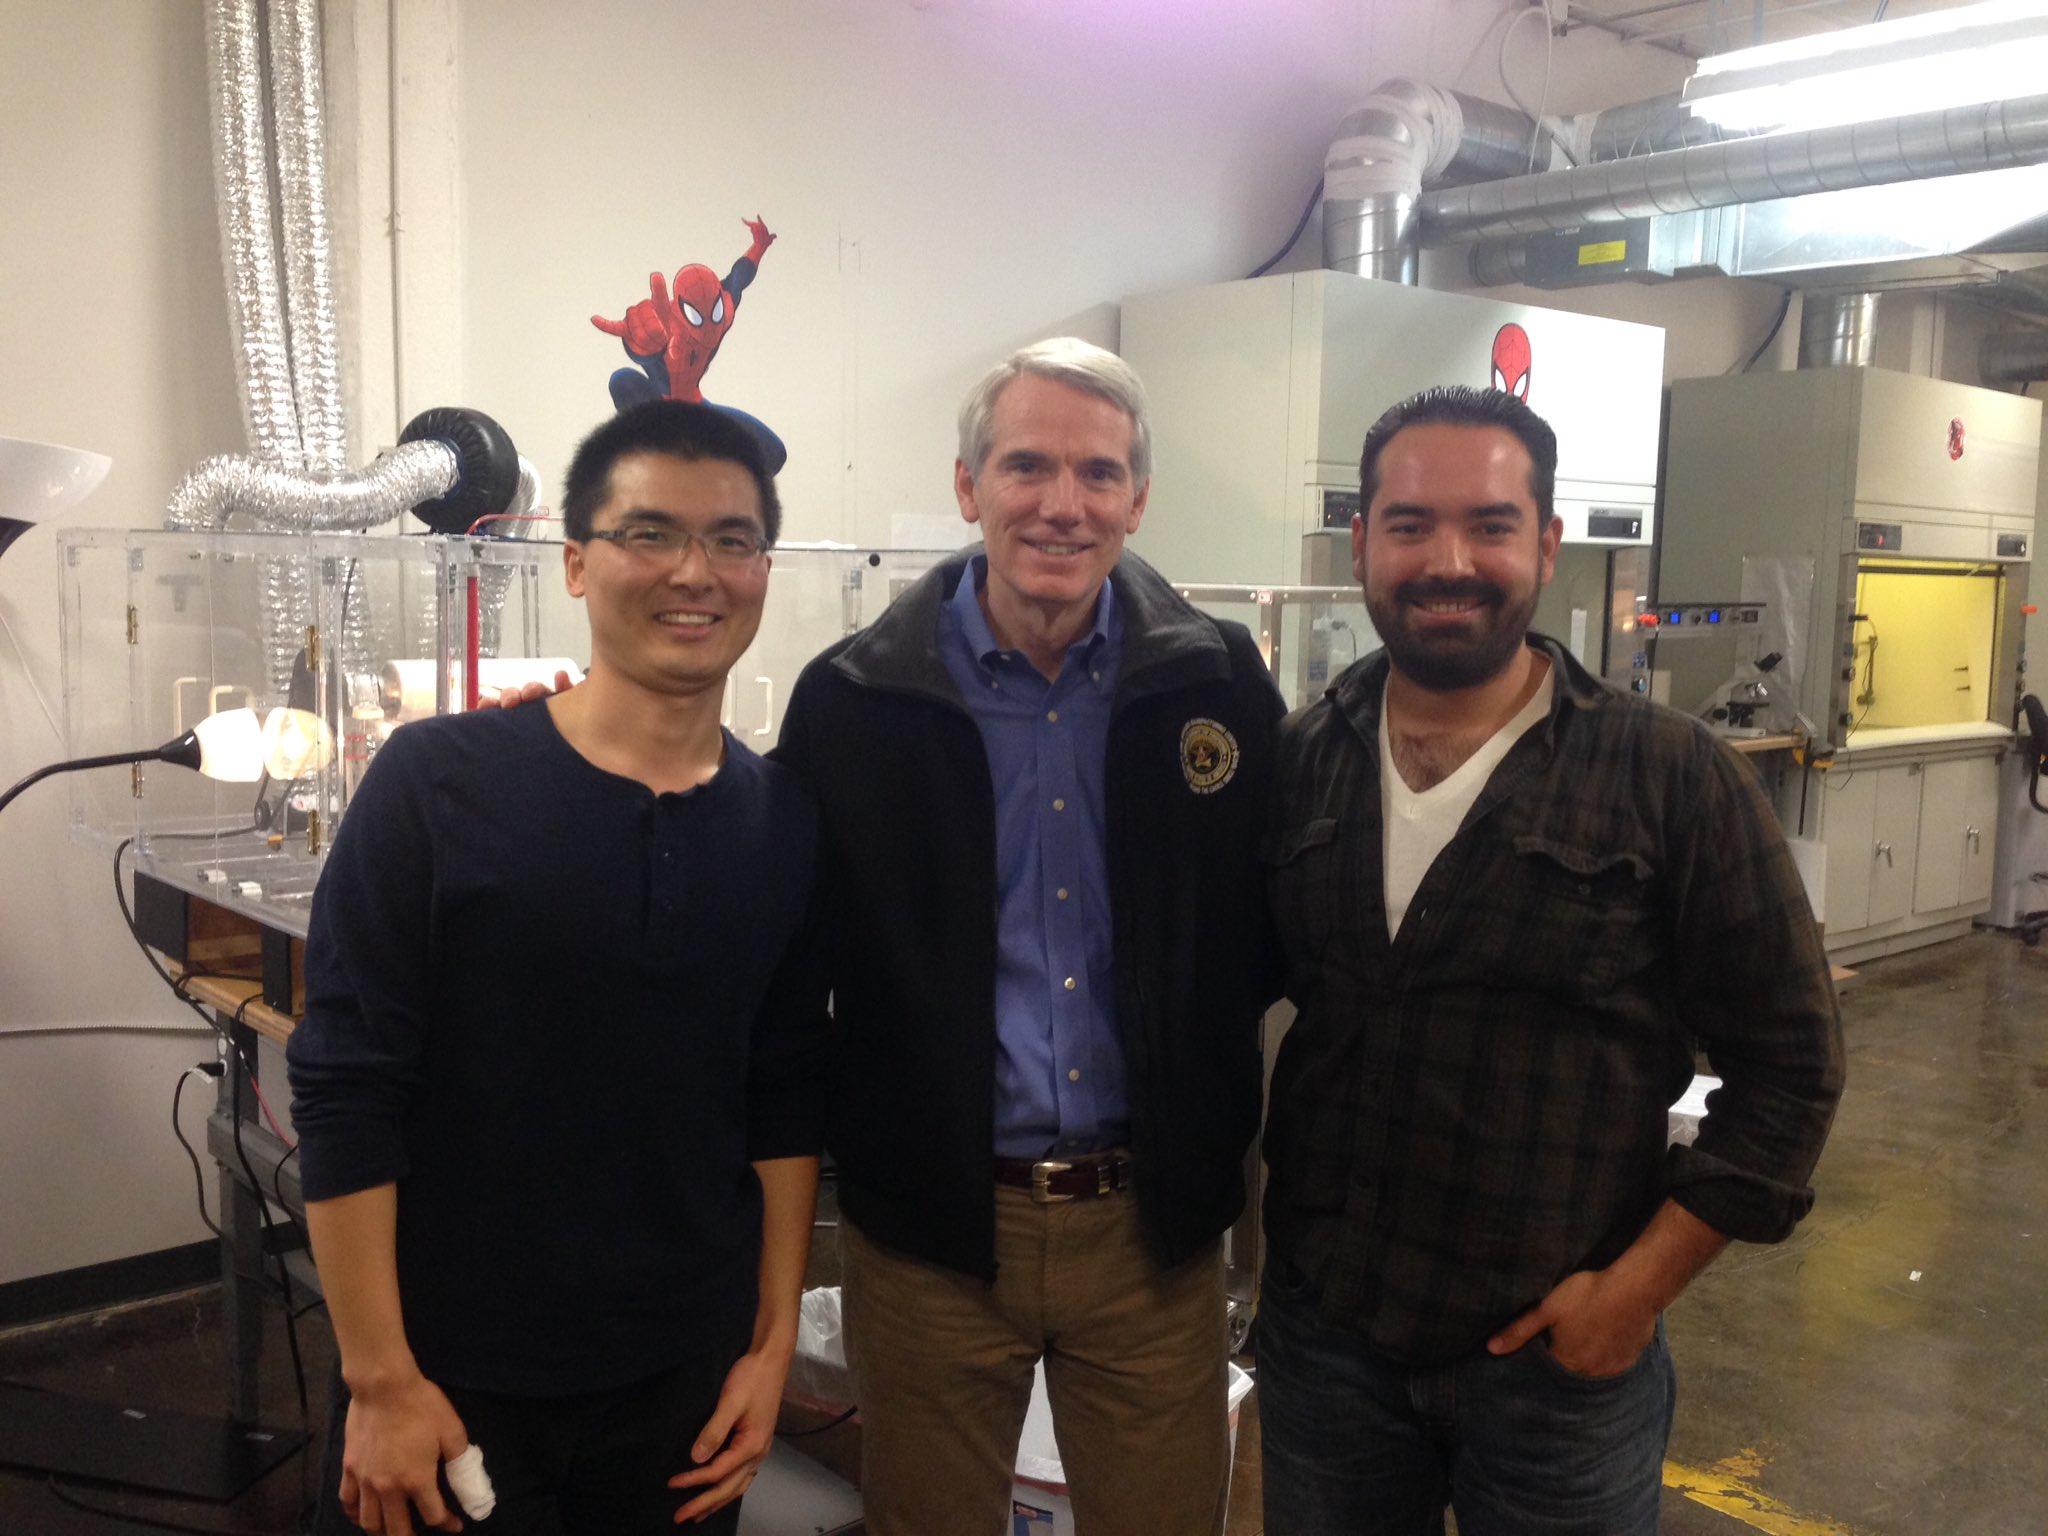 AAI's Dr. Fei Wang and Ali Blandon give Senator Rob Portman a lab tour at the Akron Accelerator.